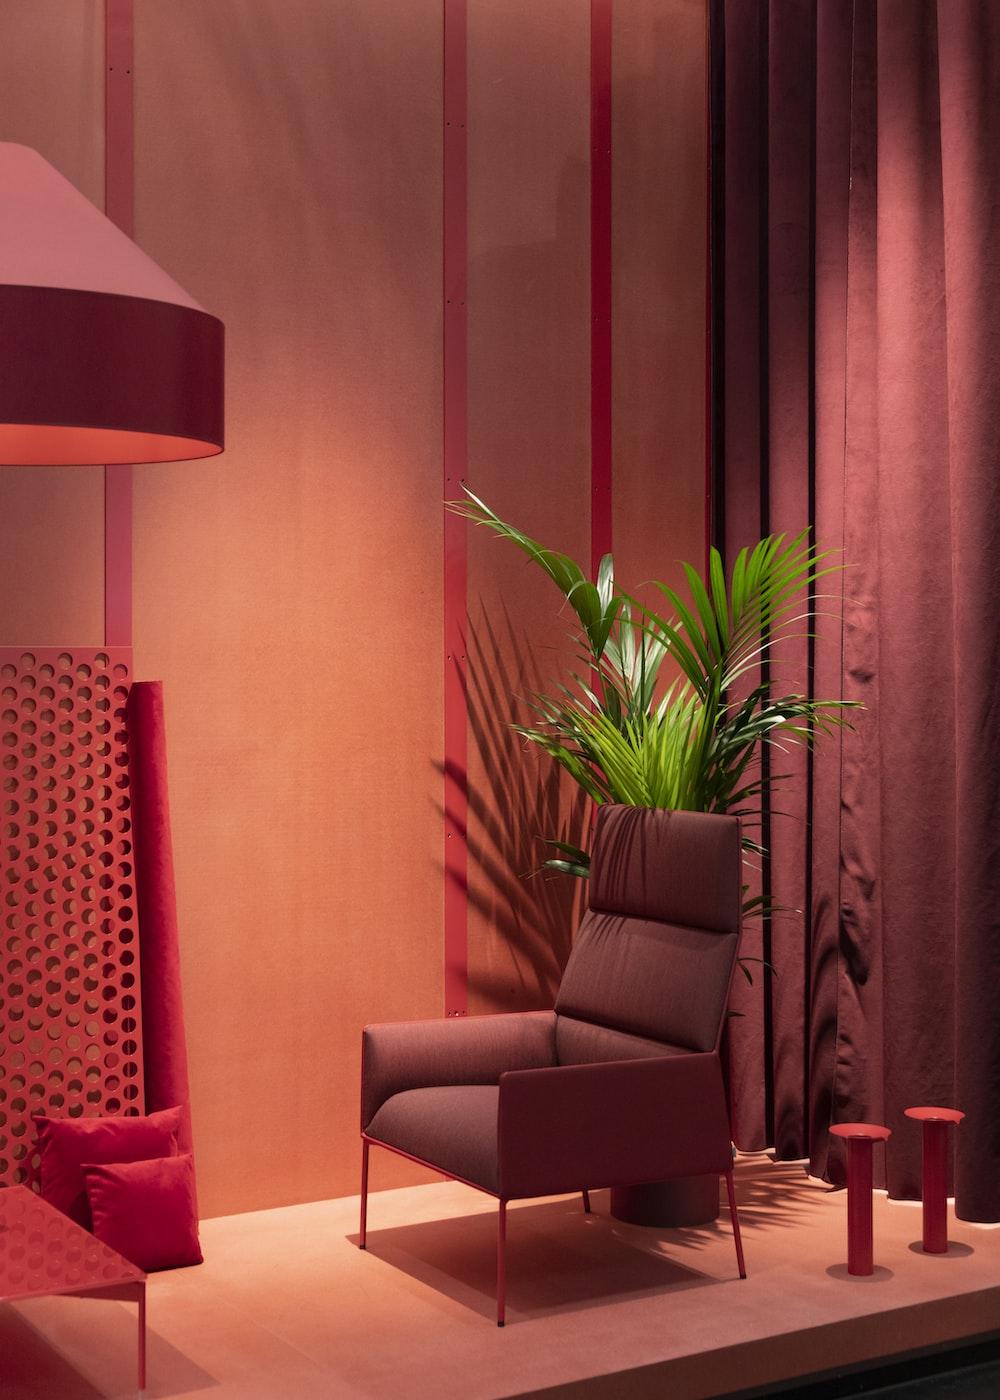 empty gray sofa chair beside palm tree